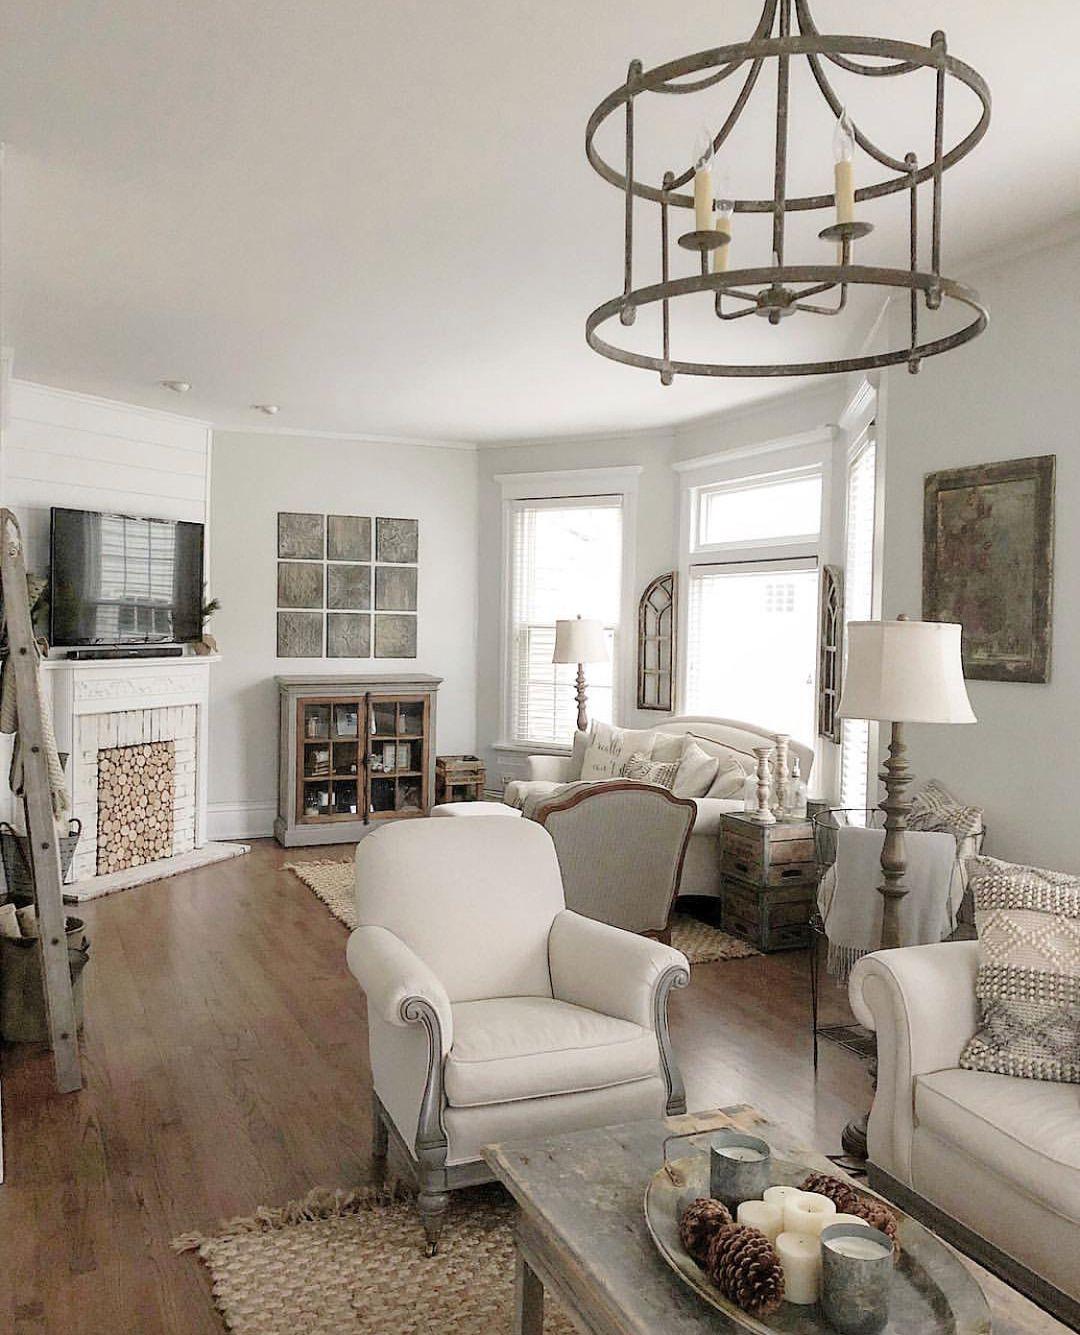 Stylish white home decor homedecor livingroomideas white